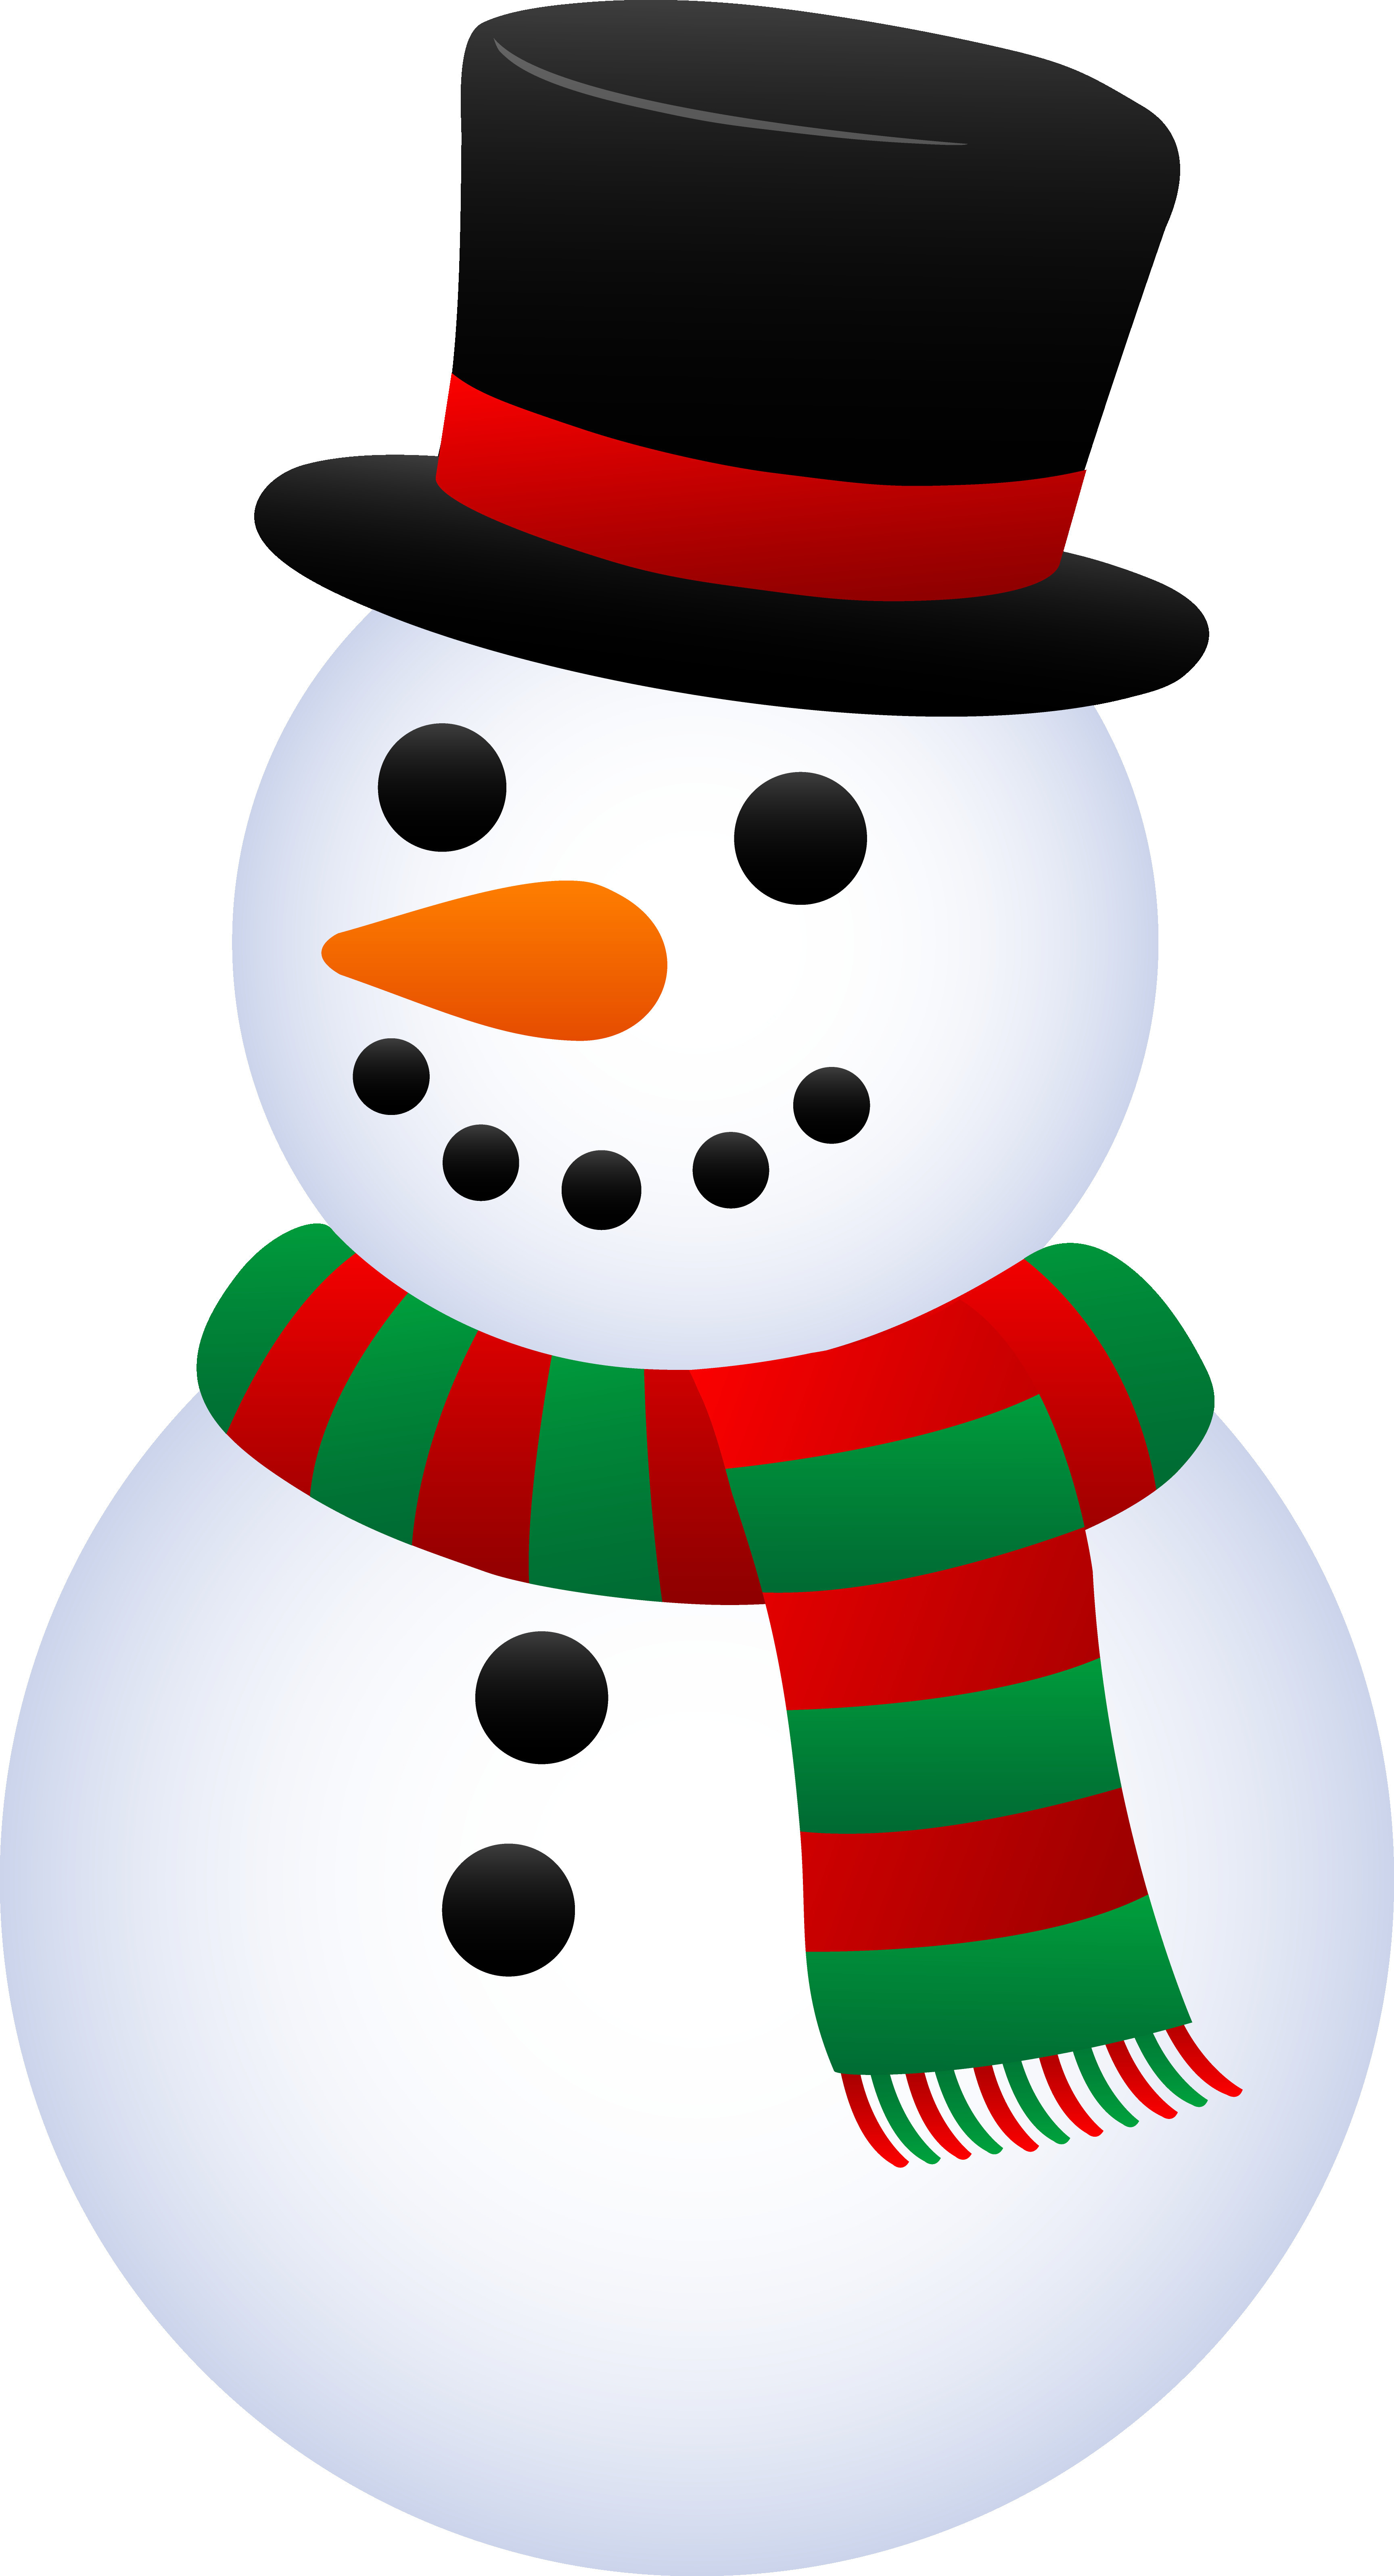 3455x6386 Snowman Clip Art Free Thatswhatsup